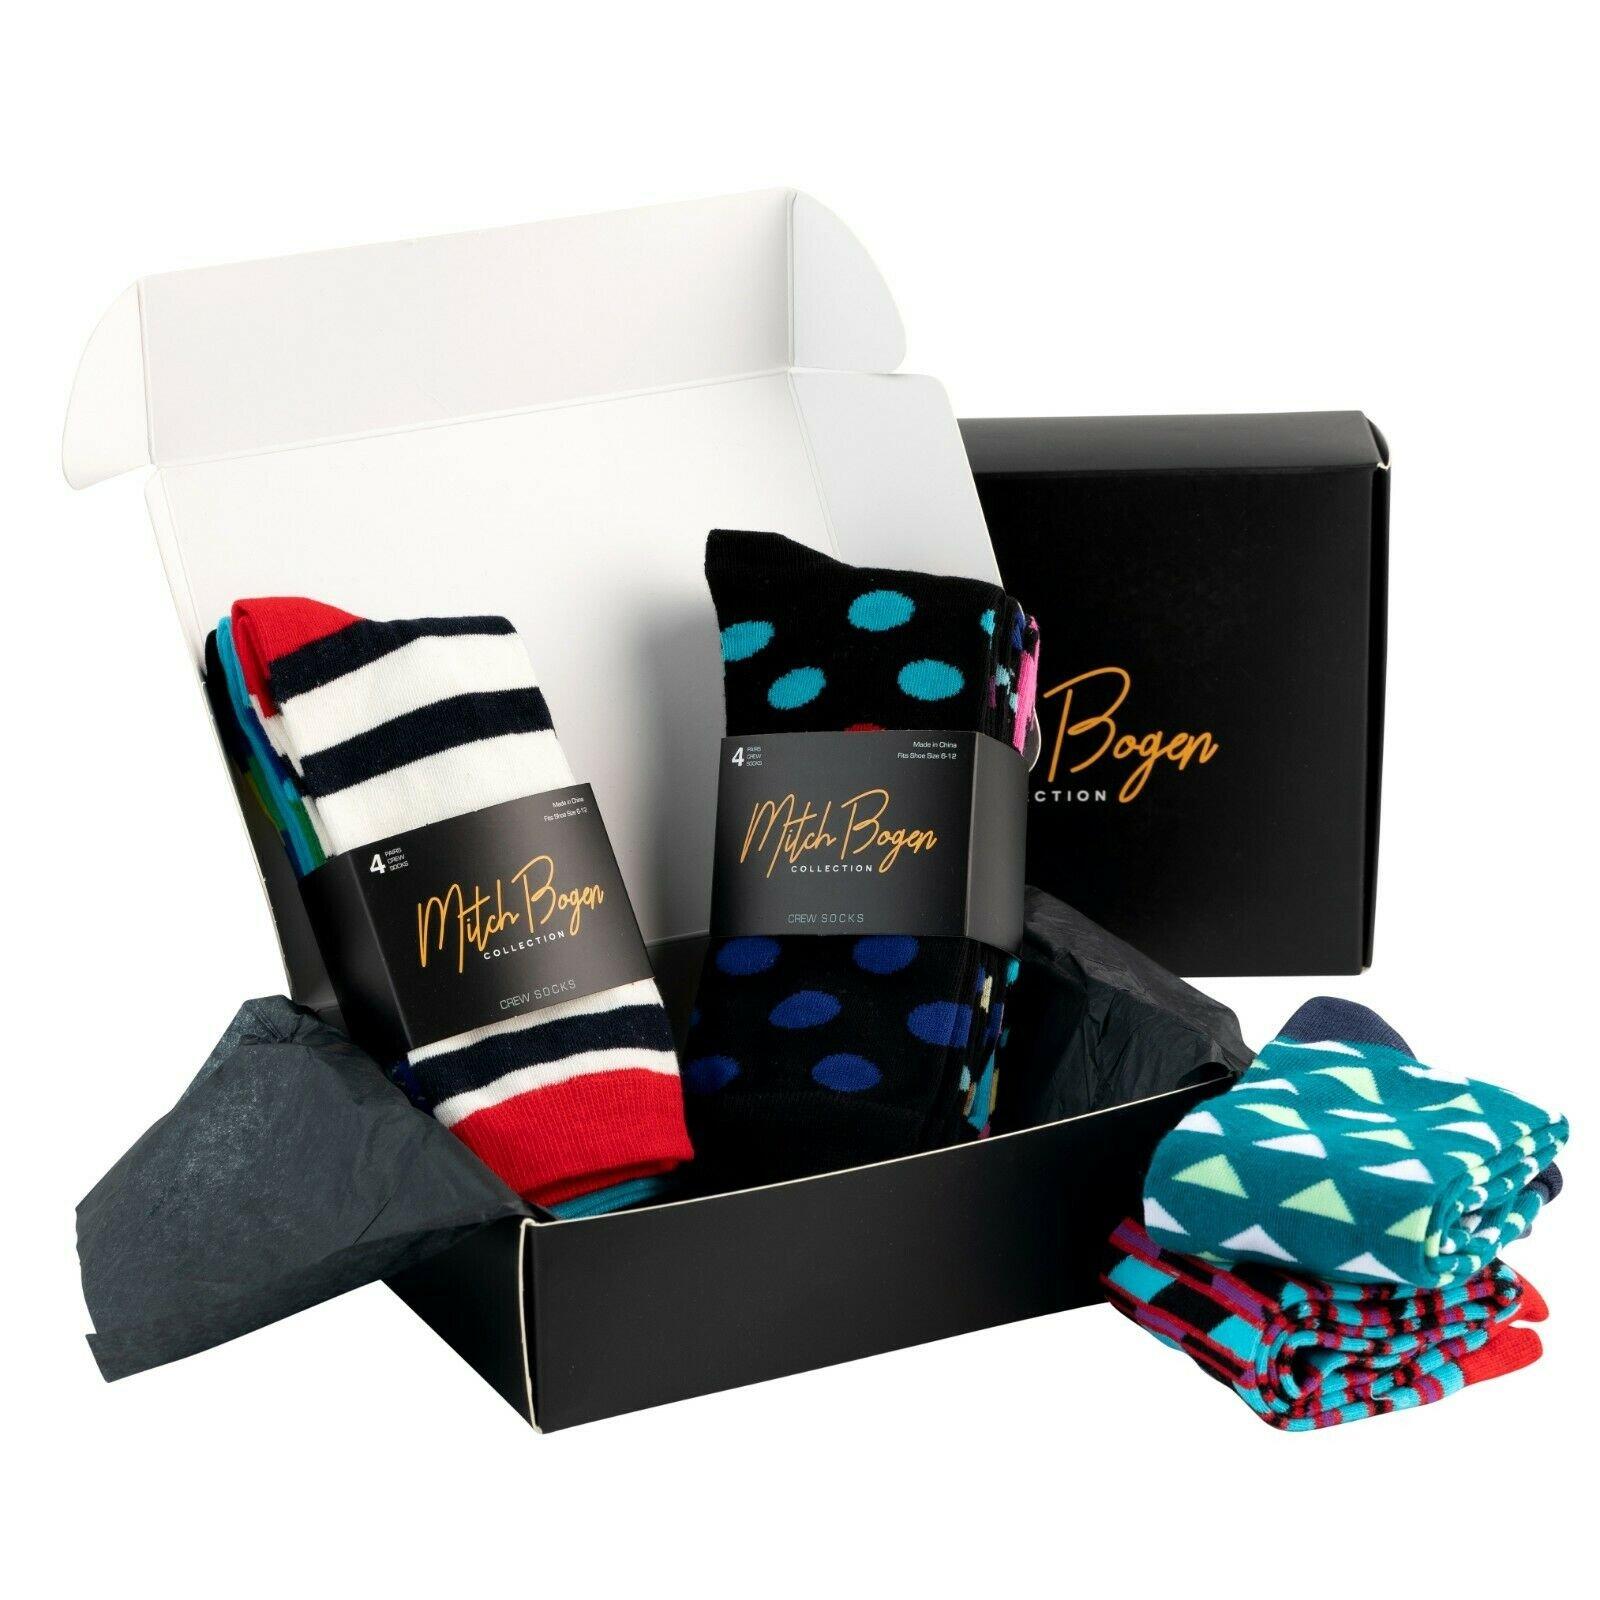 Mitch-Bogen-Mens-Cotton-Dress-Socks-Colorful-Fashion-Crew-Socks-8-Pack-Gift-Box thumbnail 38